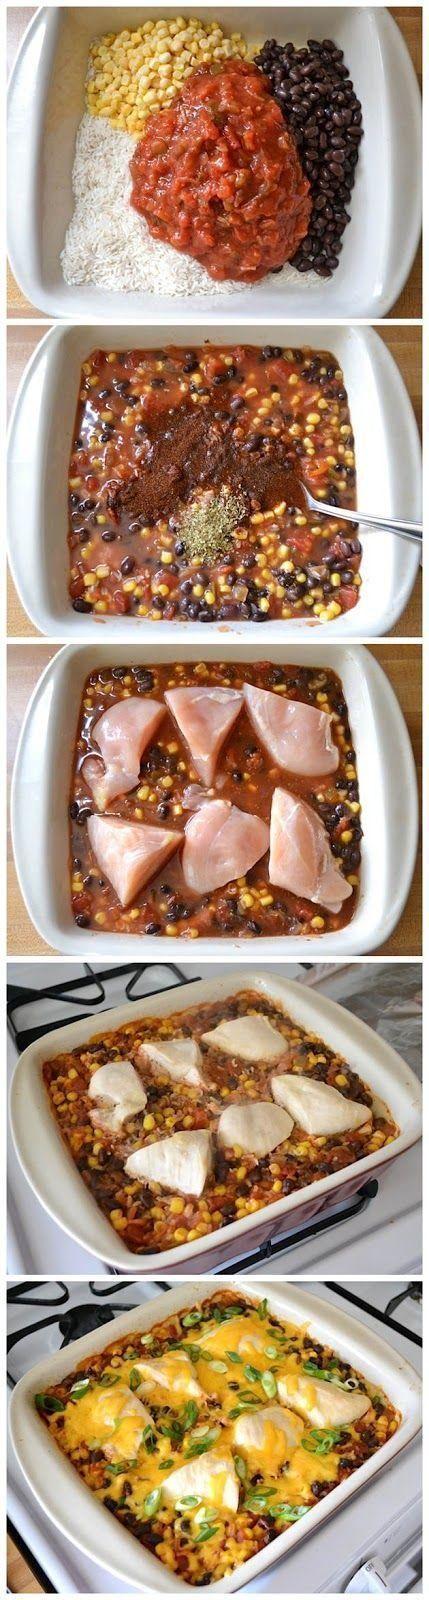 Chicken breast accompanied frigoles oven, shredded cheese, corn, tomato sauce and spicy Pechuga de pollo al horno acompañada de frigoles, queso rayado, maiz, salsa de tomate y picante